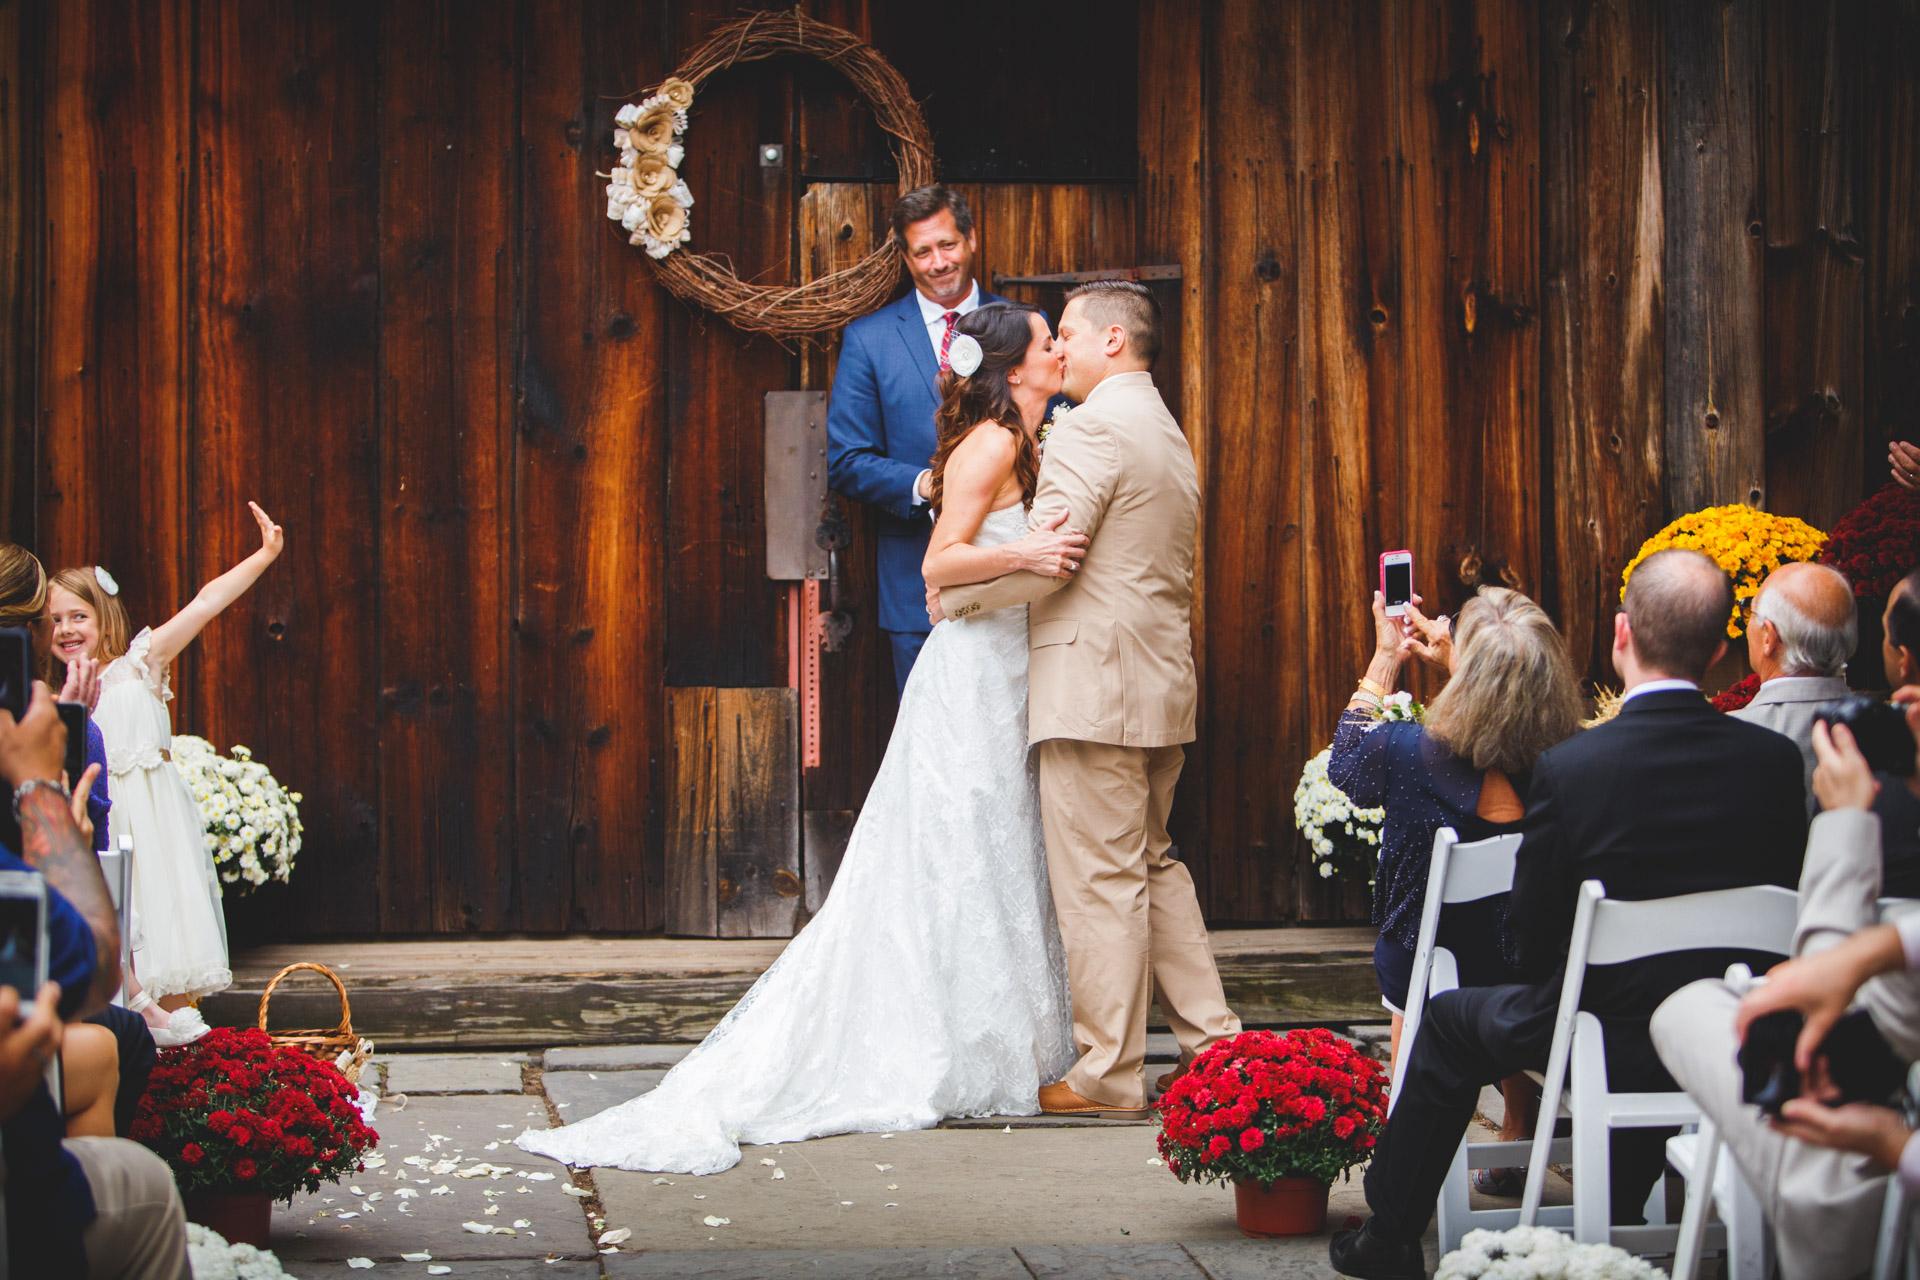 Wedding Photos at Webb Barn Wethersfield -19.jpg